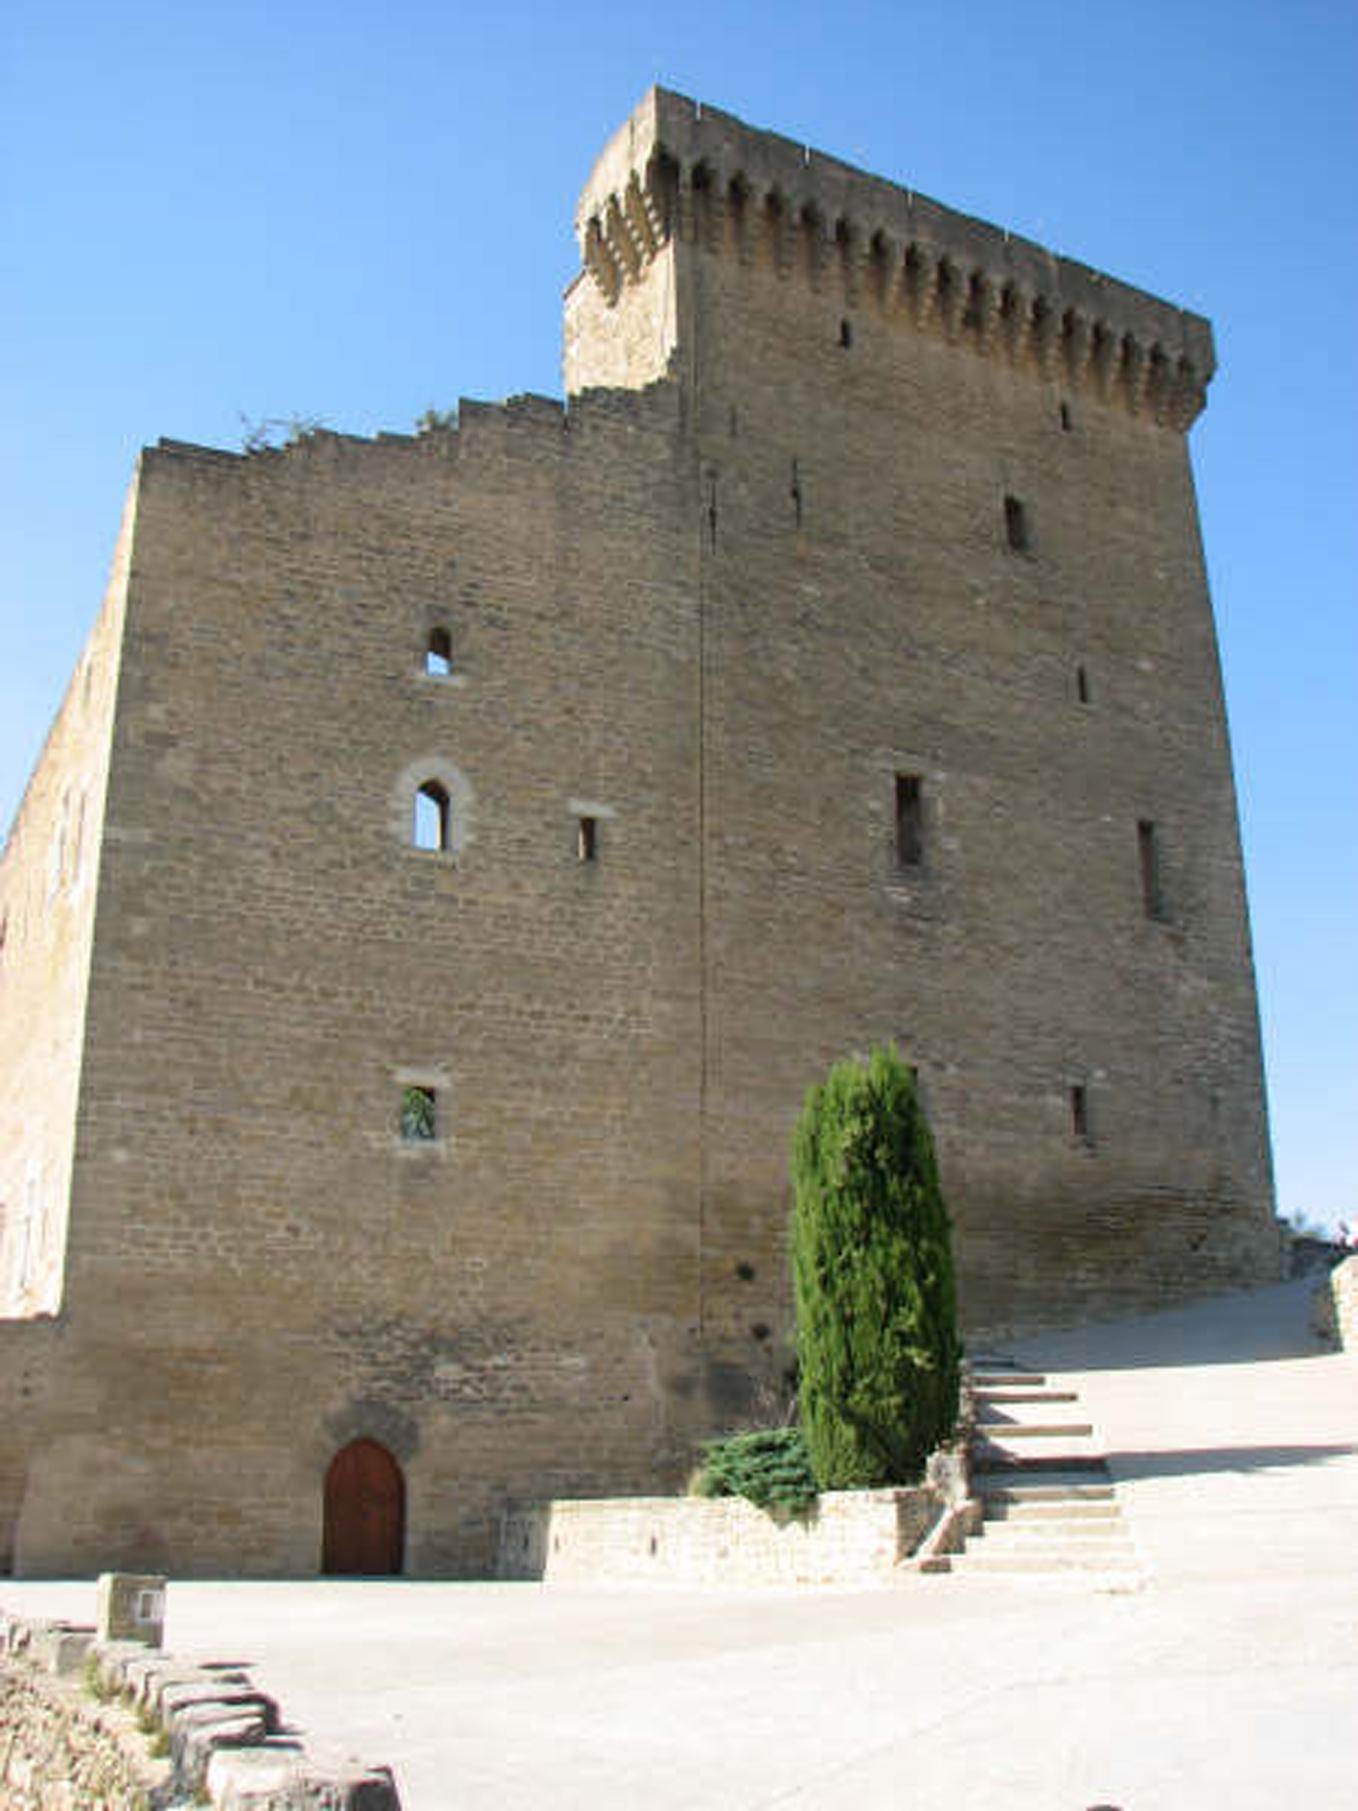 Chateau Chateauneuf-du-pape